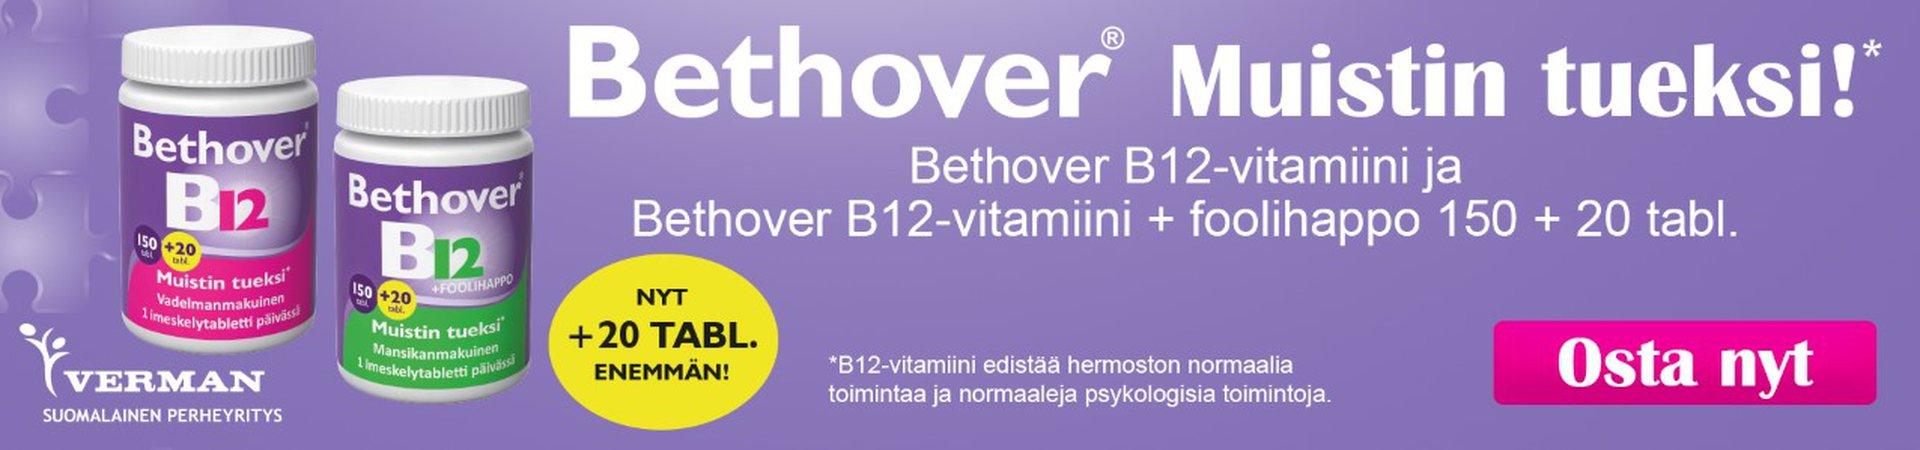 Bethover B12 vitamiinit maaliskuussa